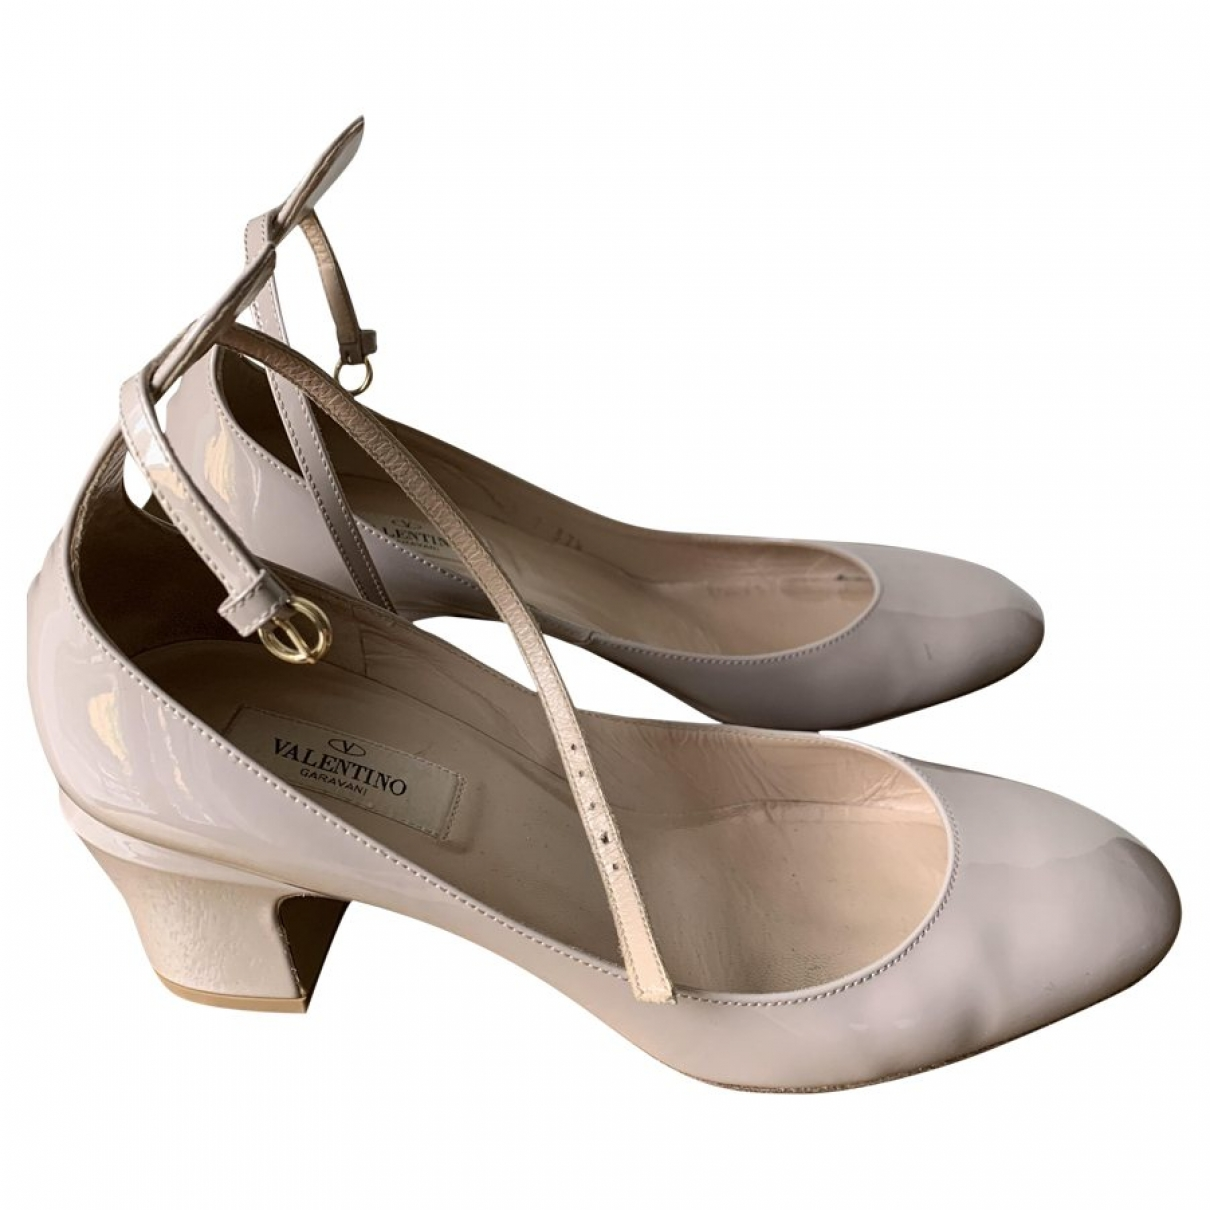 Valentino Garavani Tango Beige Patent leather Heels for Women 37.5 EU